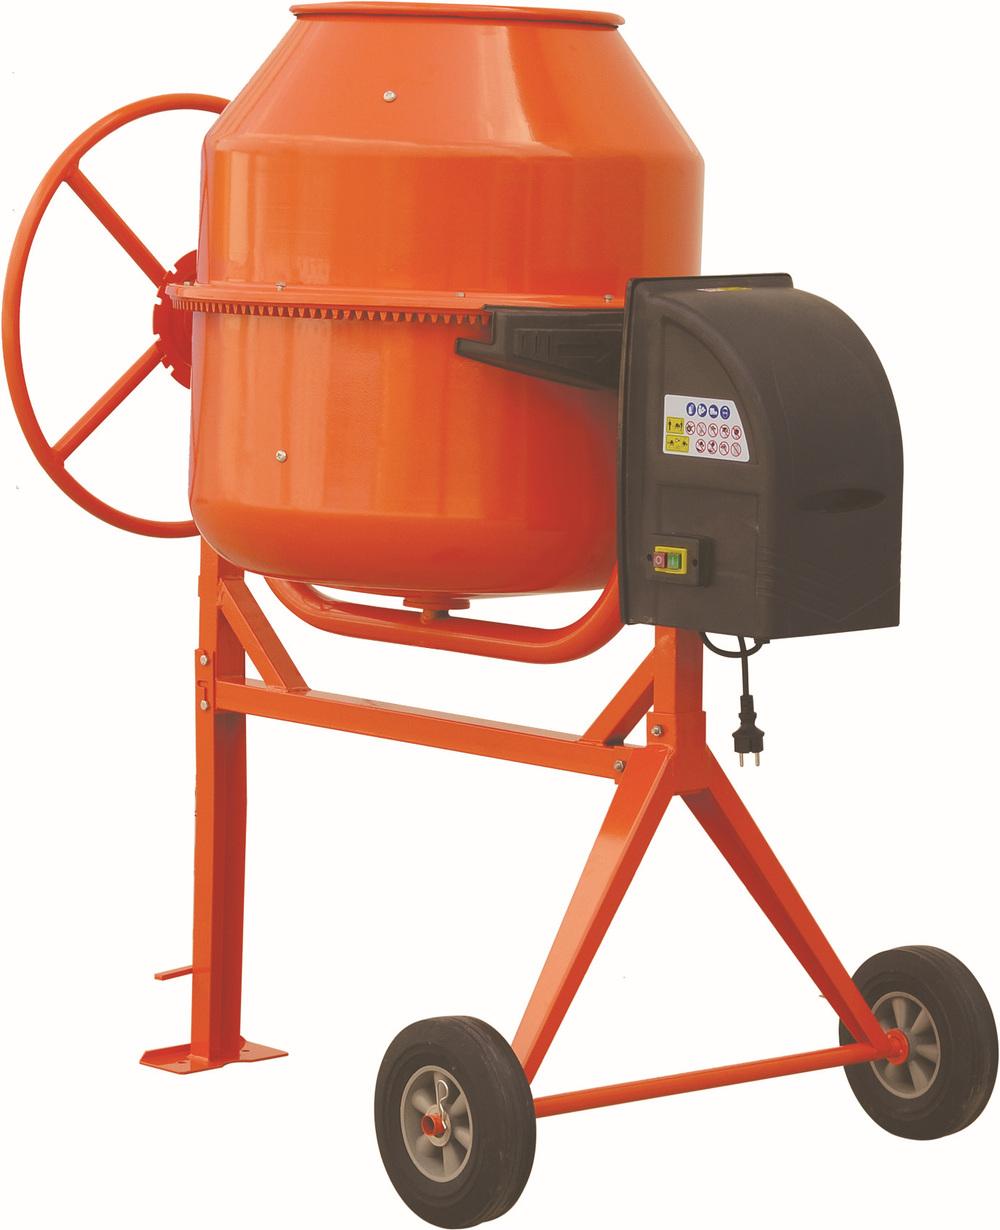 Electric Mobile Mixer Concrete Mixer Machine Price Buy